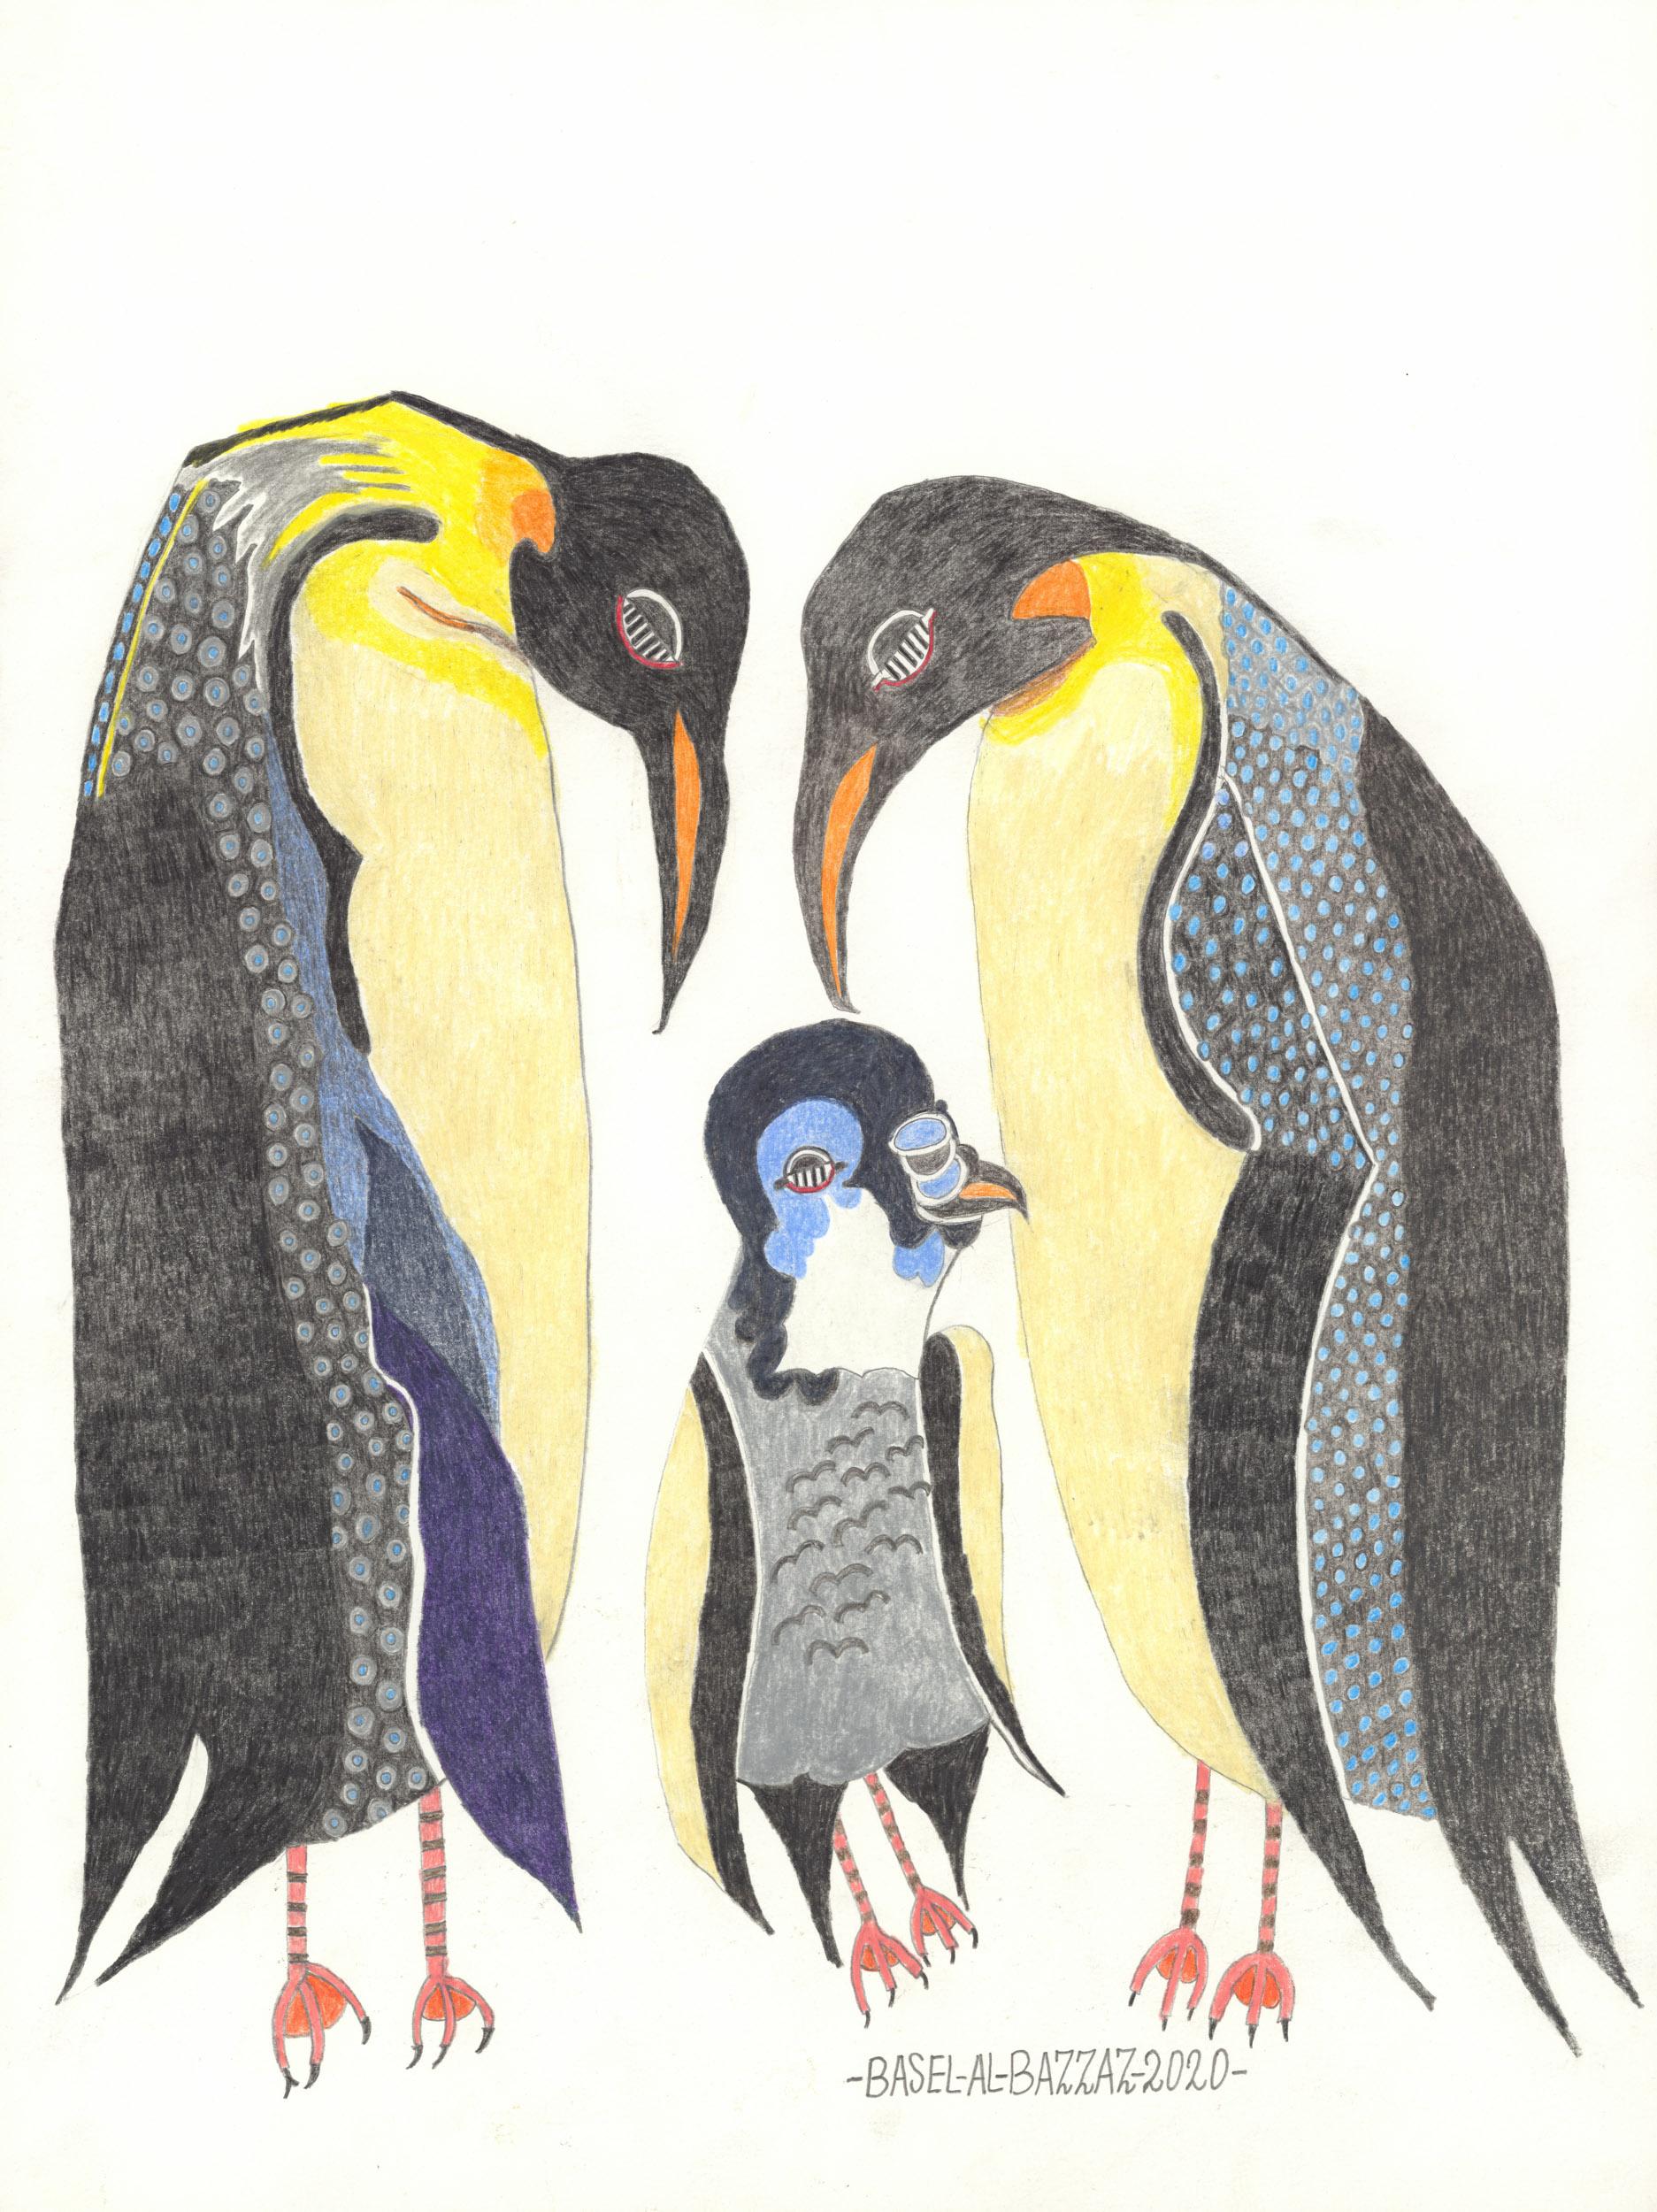 al-bazzaz basel - Pinguin Familie / Penguin family